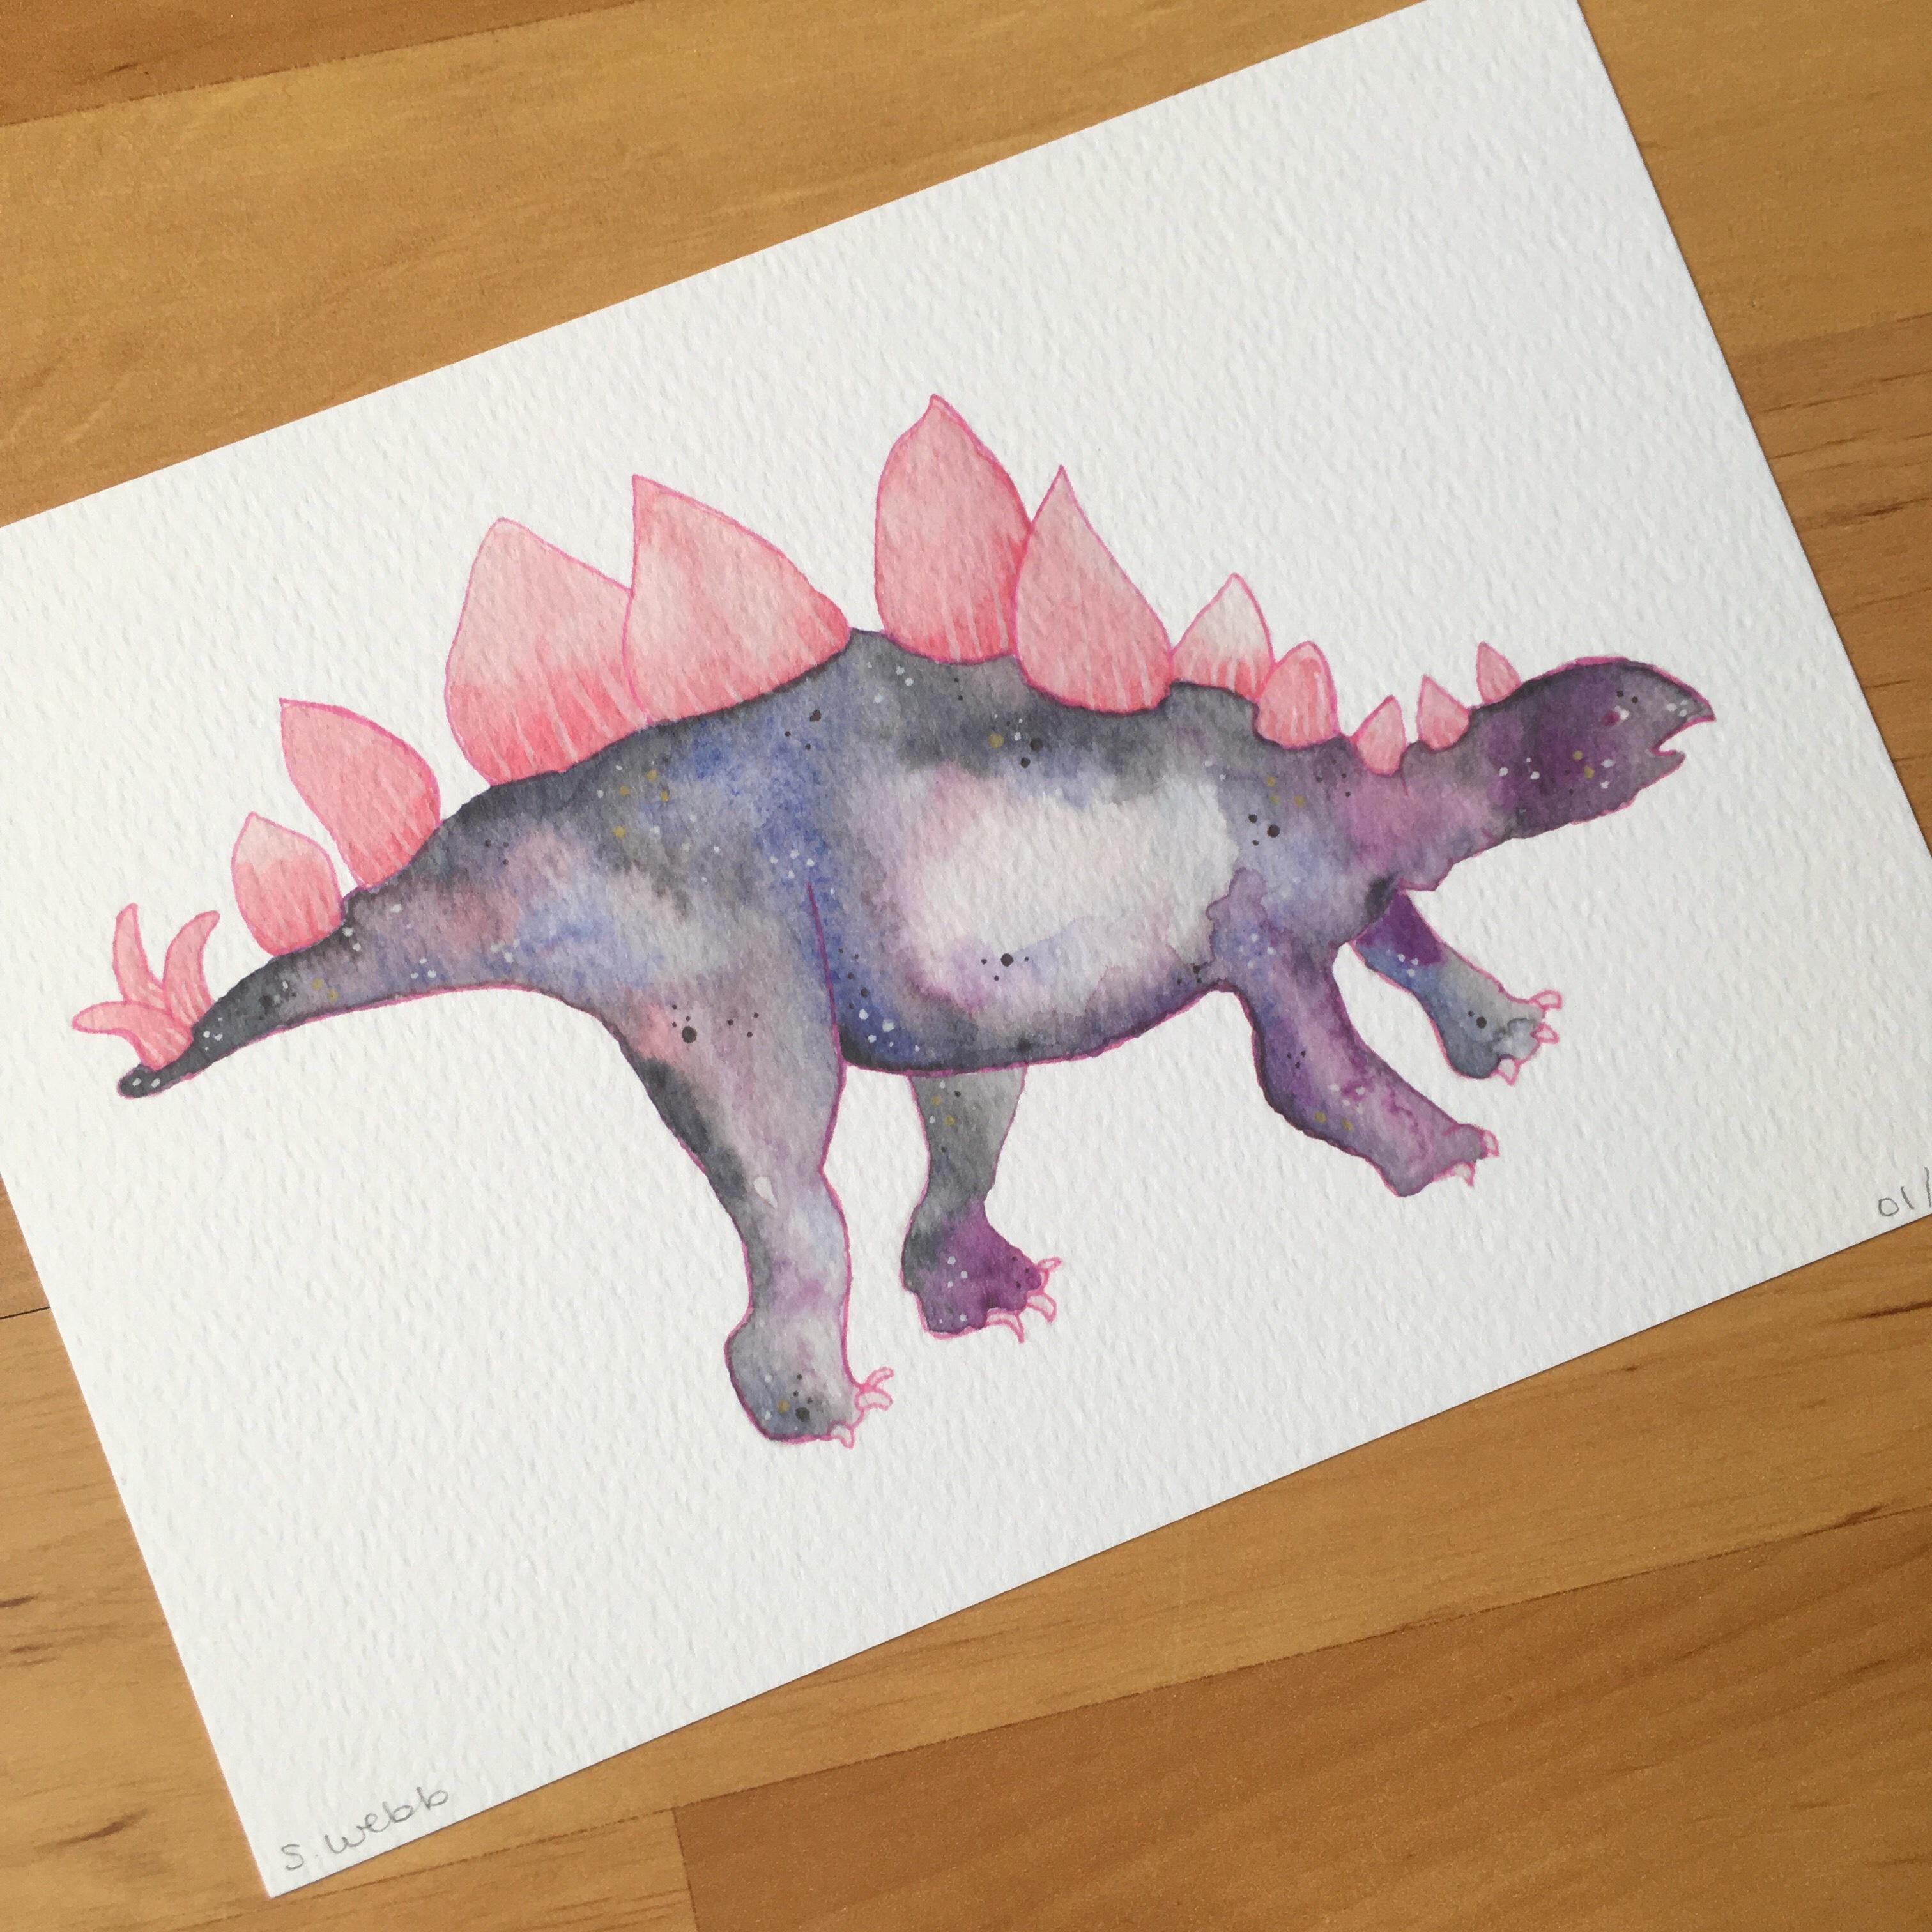 Stargazersaurus watercolour dinosaur by Samantha Webb